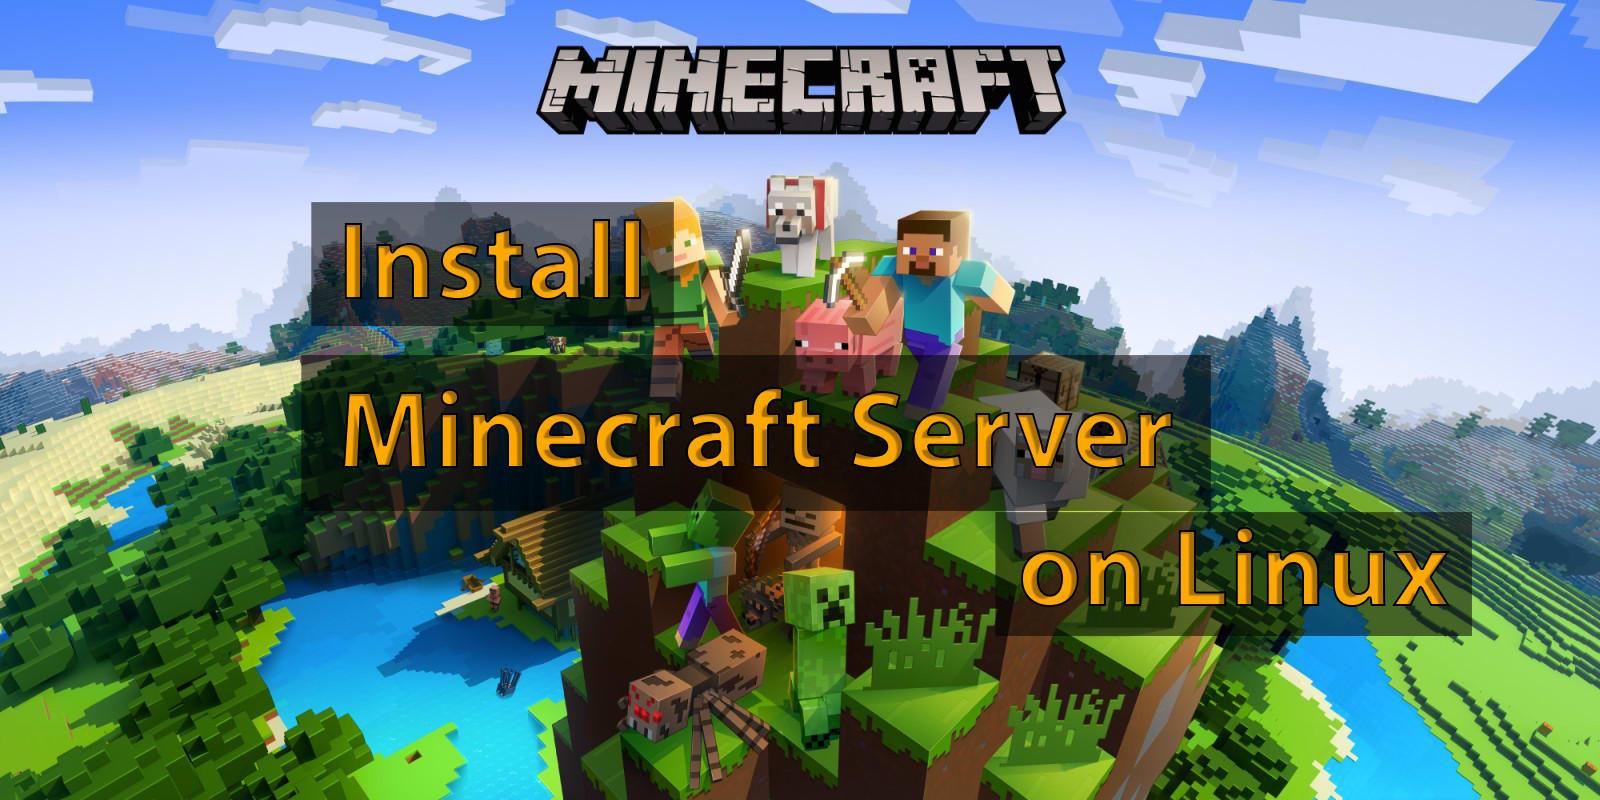 Install Minecraft On Your Linux Server By Donatplayz